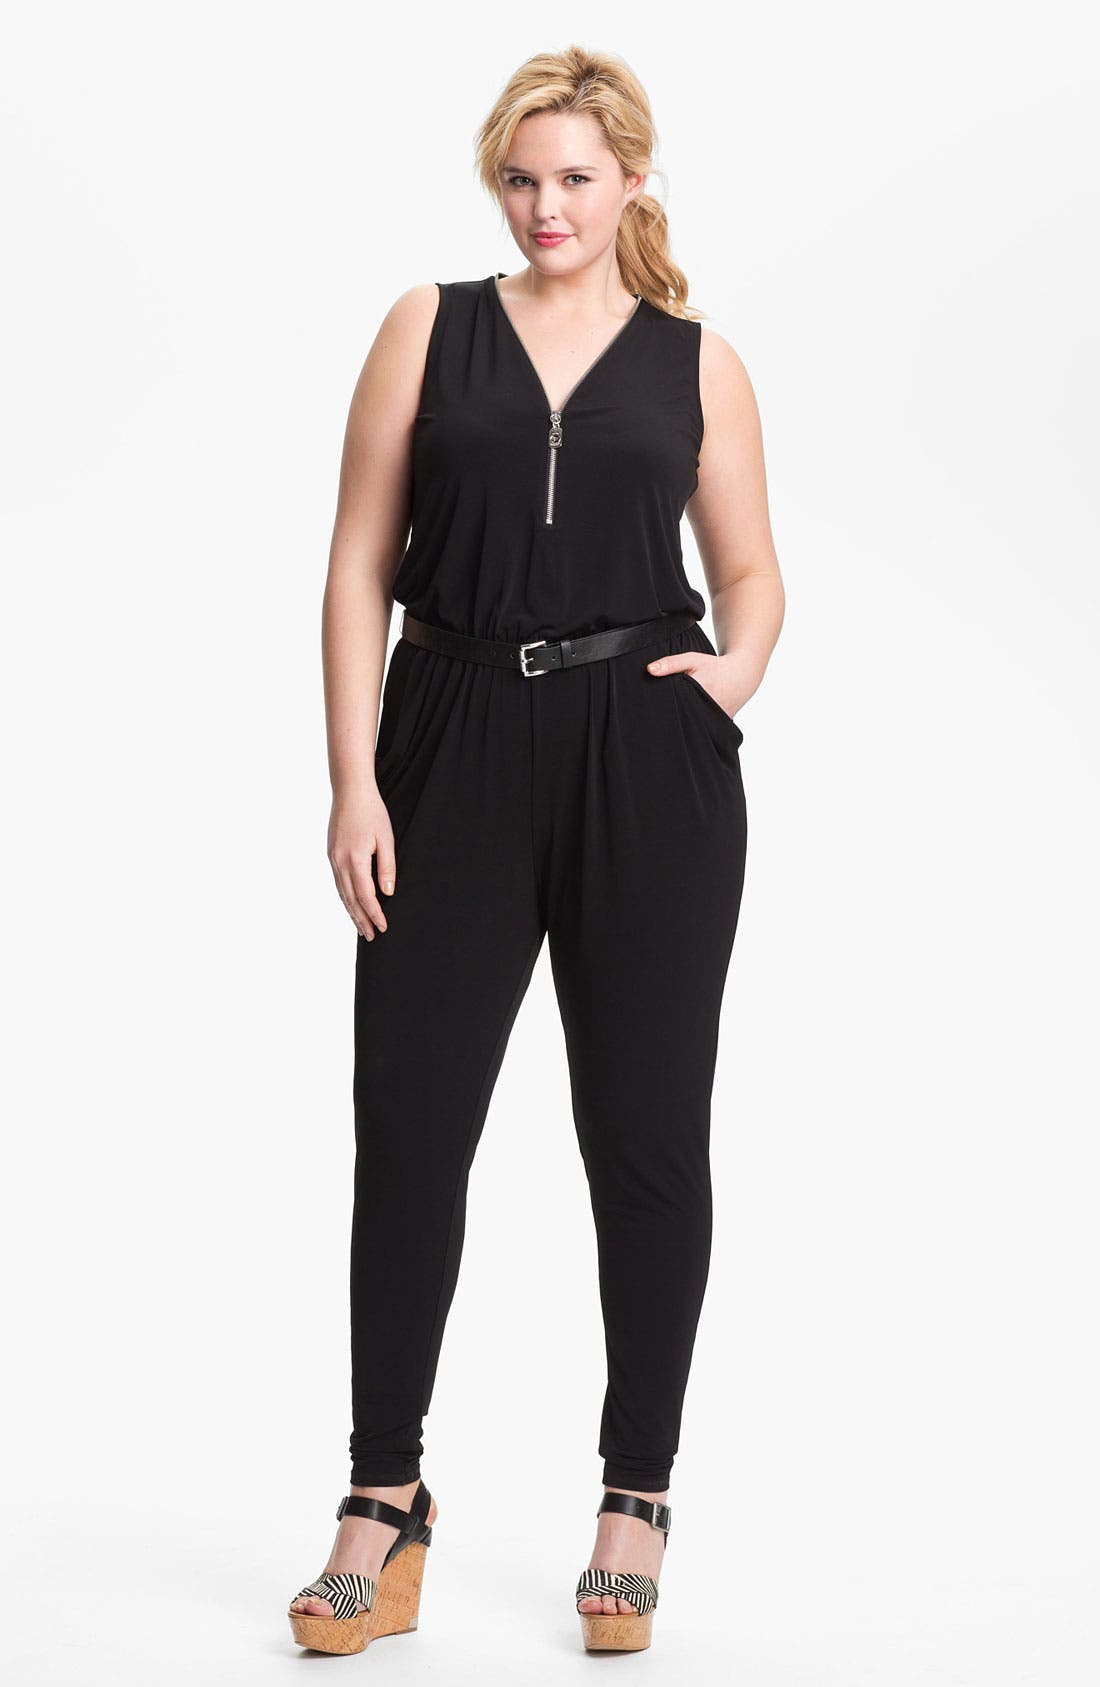 Alternate Image 1 Selected - MICHAEL Michael Kors Zip Front Jumpsuit (Plus) (Online Only)